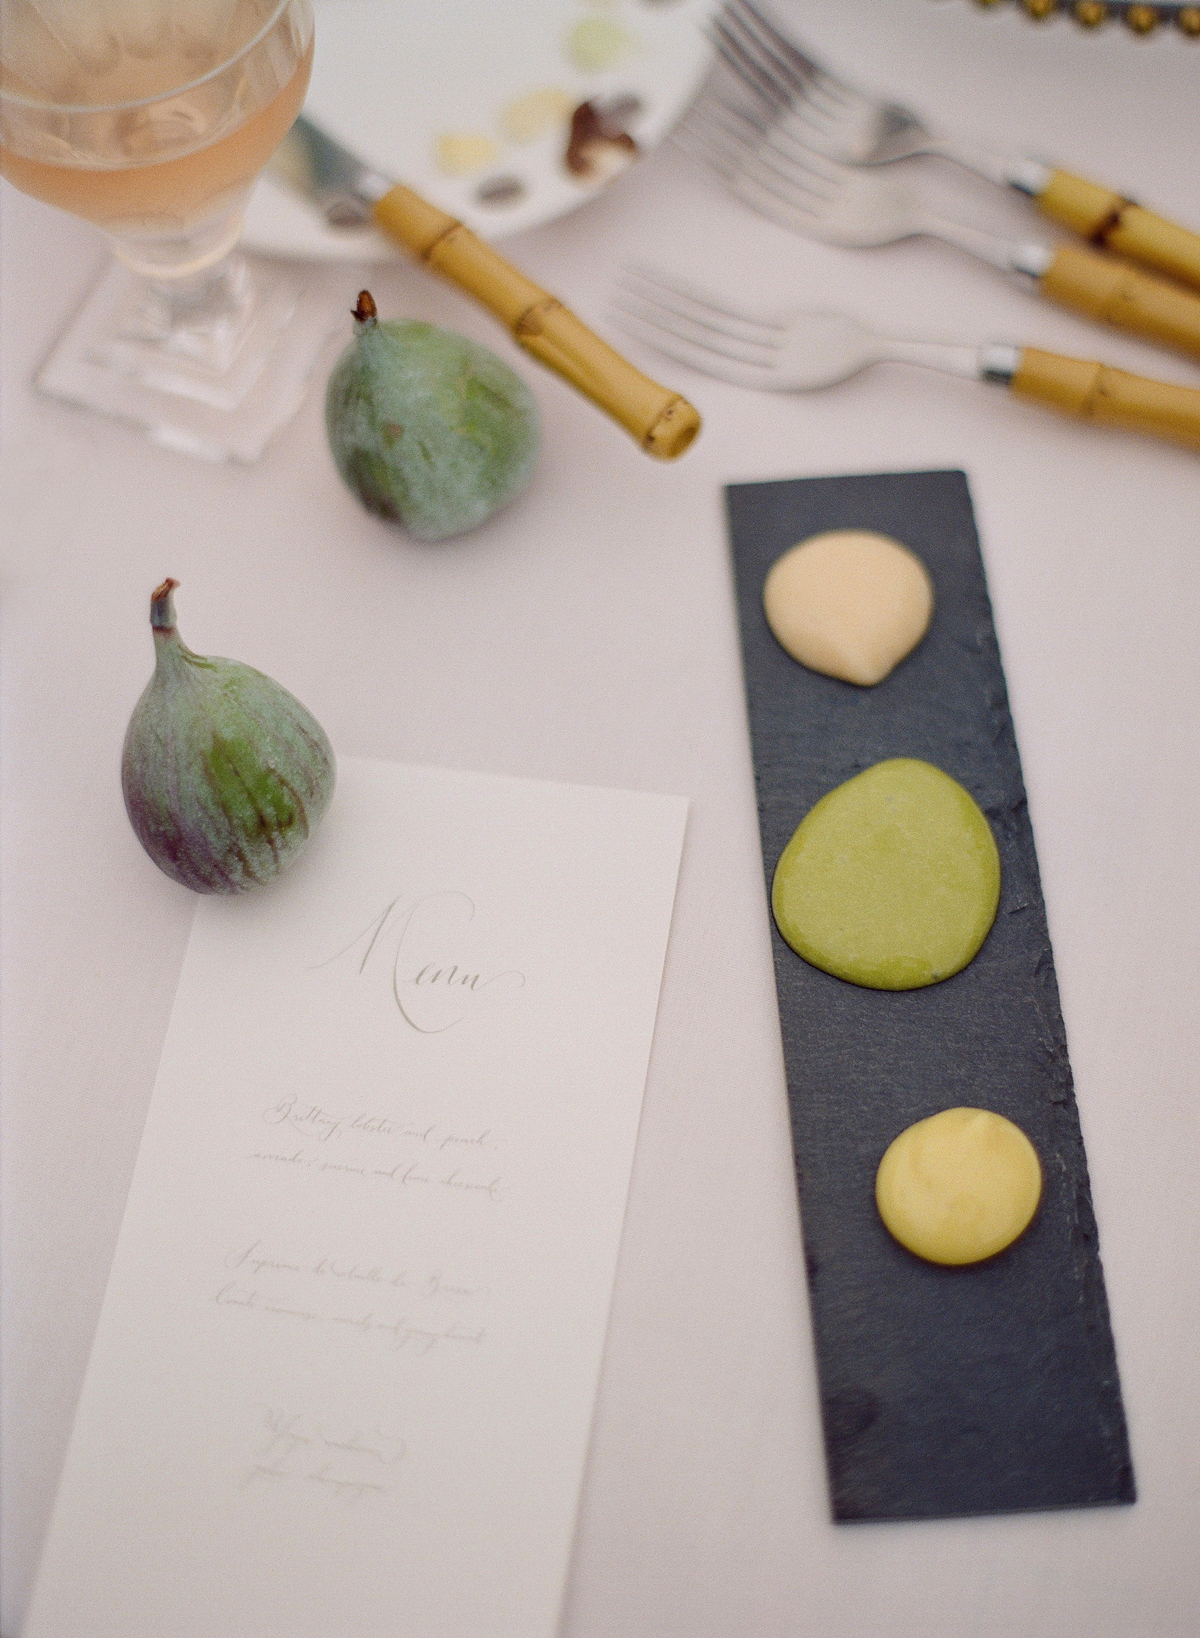 peony matthew england wedding menu with fig